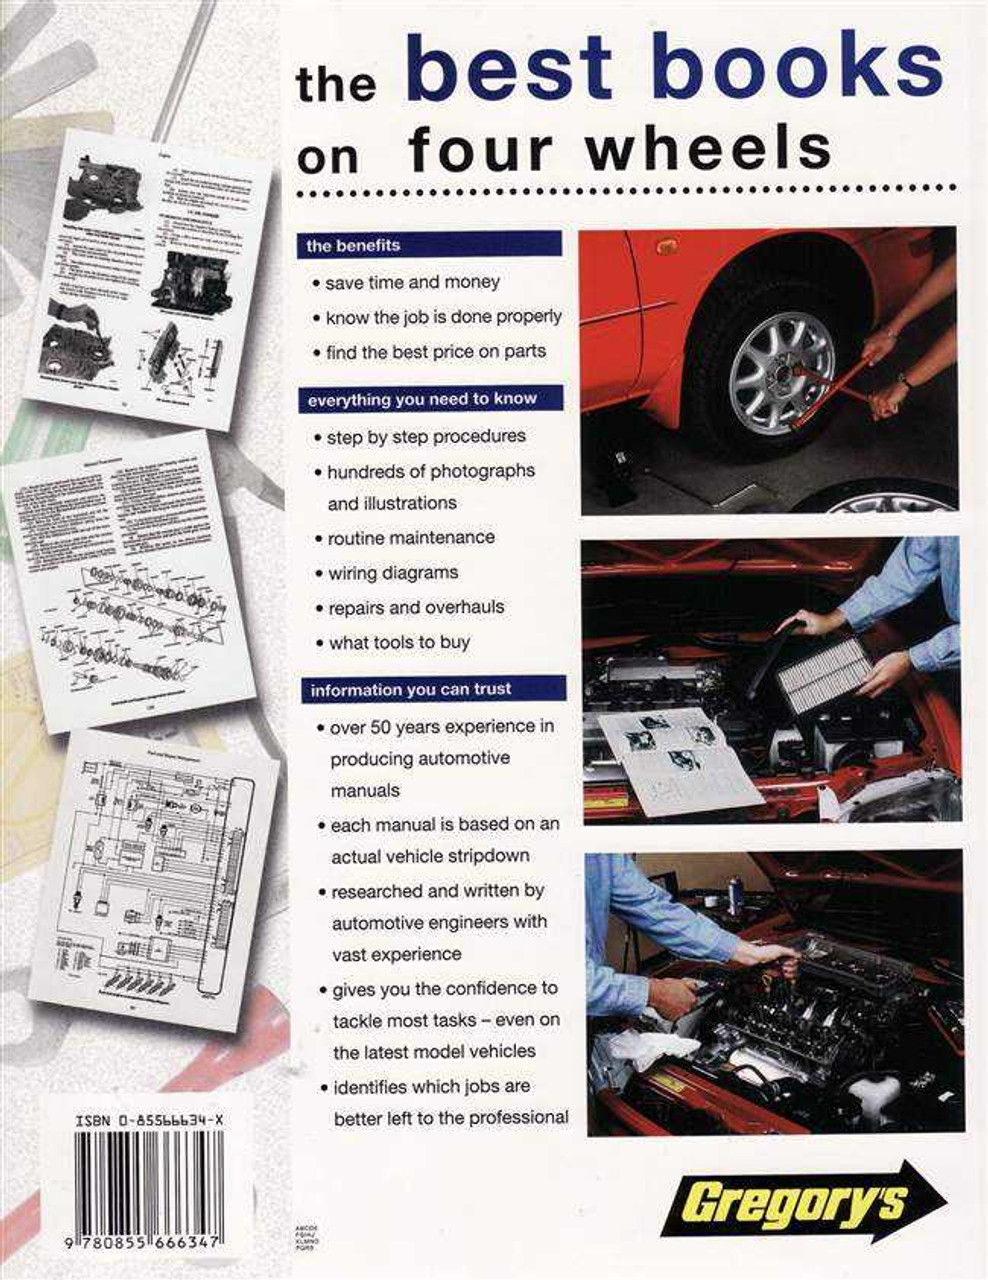 nissan pintara 1986 1989 workshop manual rh automotobookshop com au nissan pintara u12 workshop manual nissan pintara trx manual